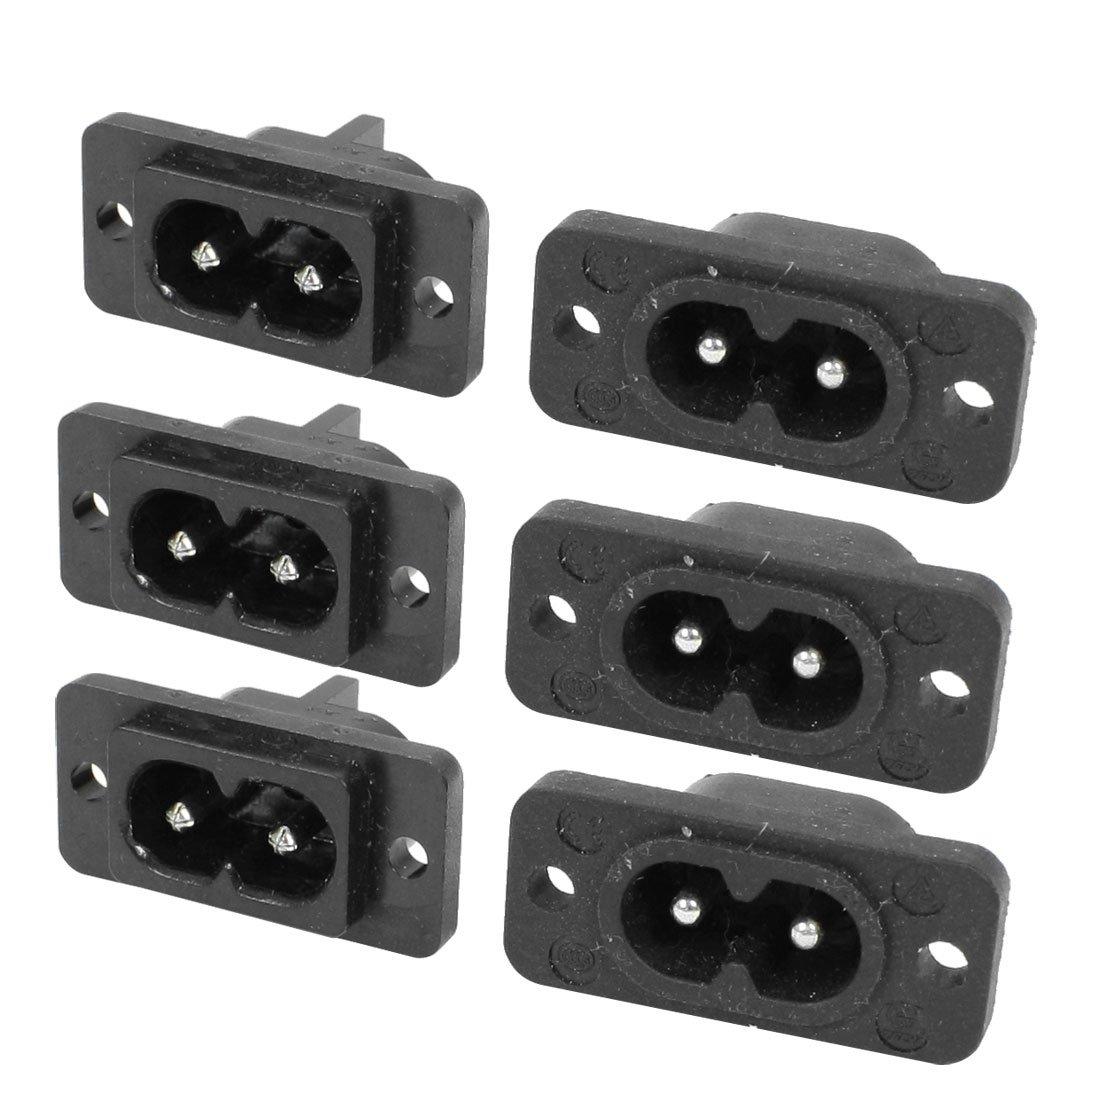 Black 2 Pin IEC320 C8 Screw Mount Inlet Plug Socket AC 250V 2.5A 6 Pcs стоимость